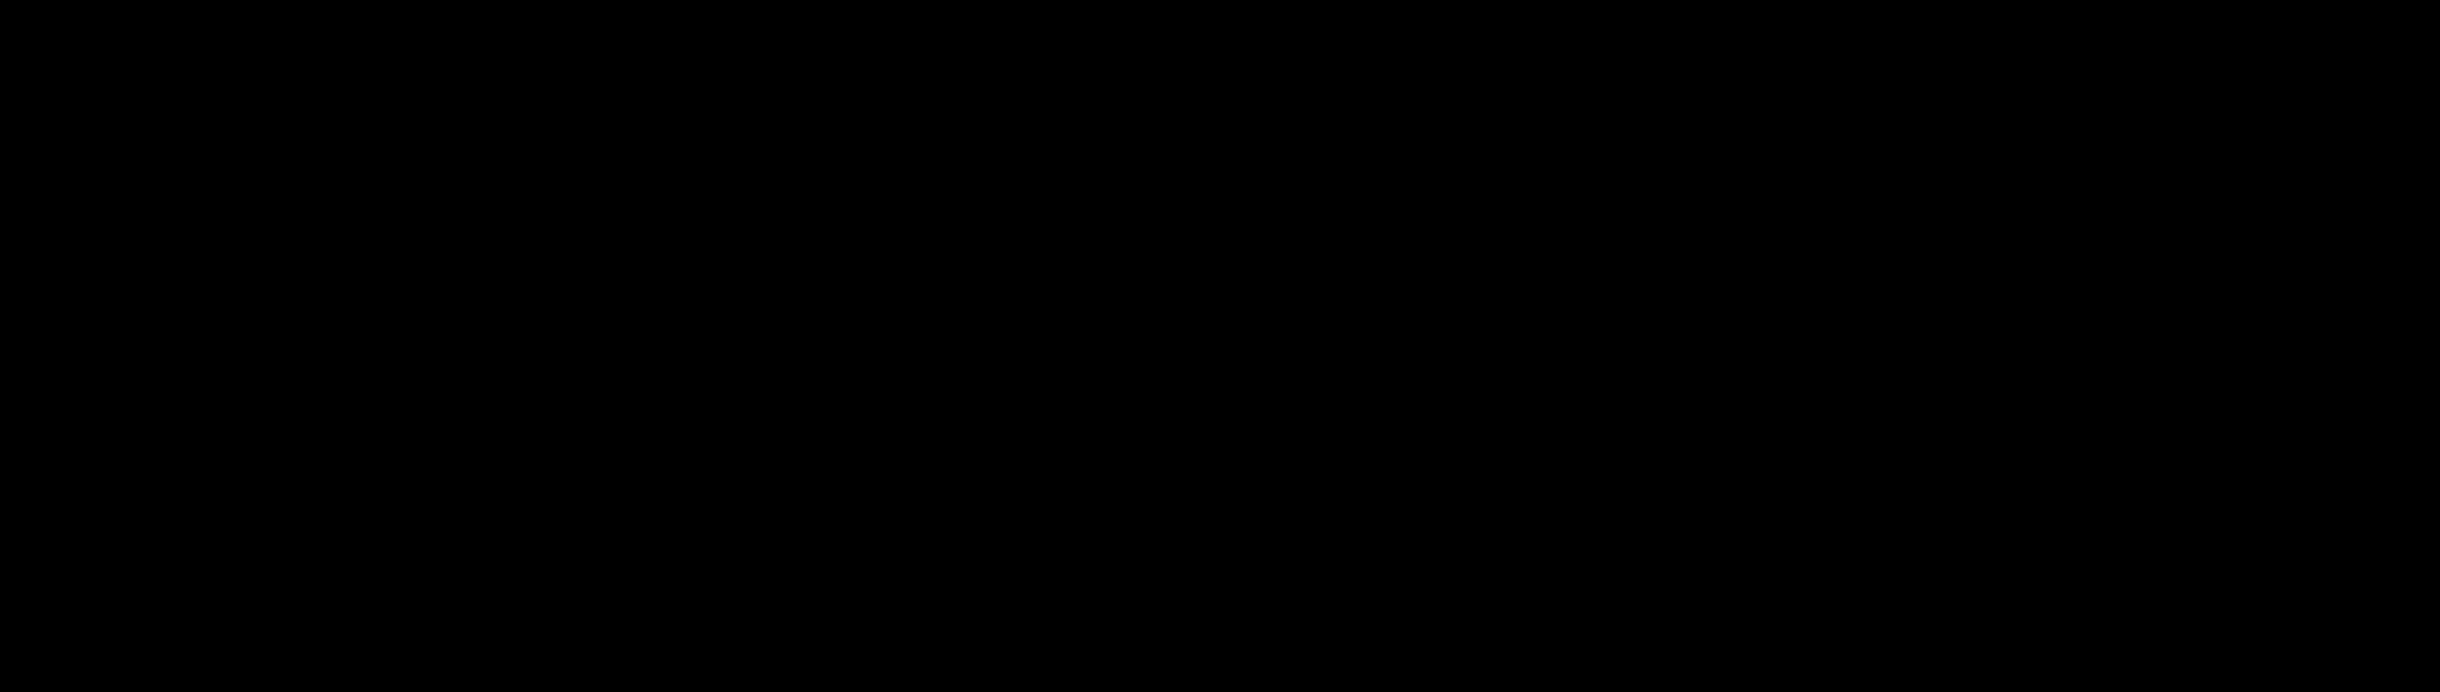 Mono-O-allylcurcumin